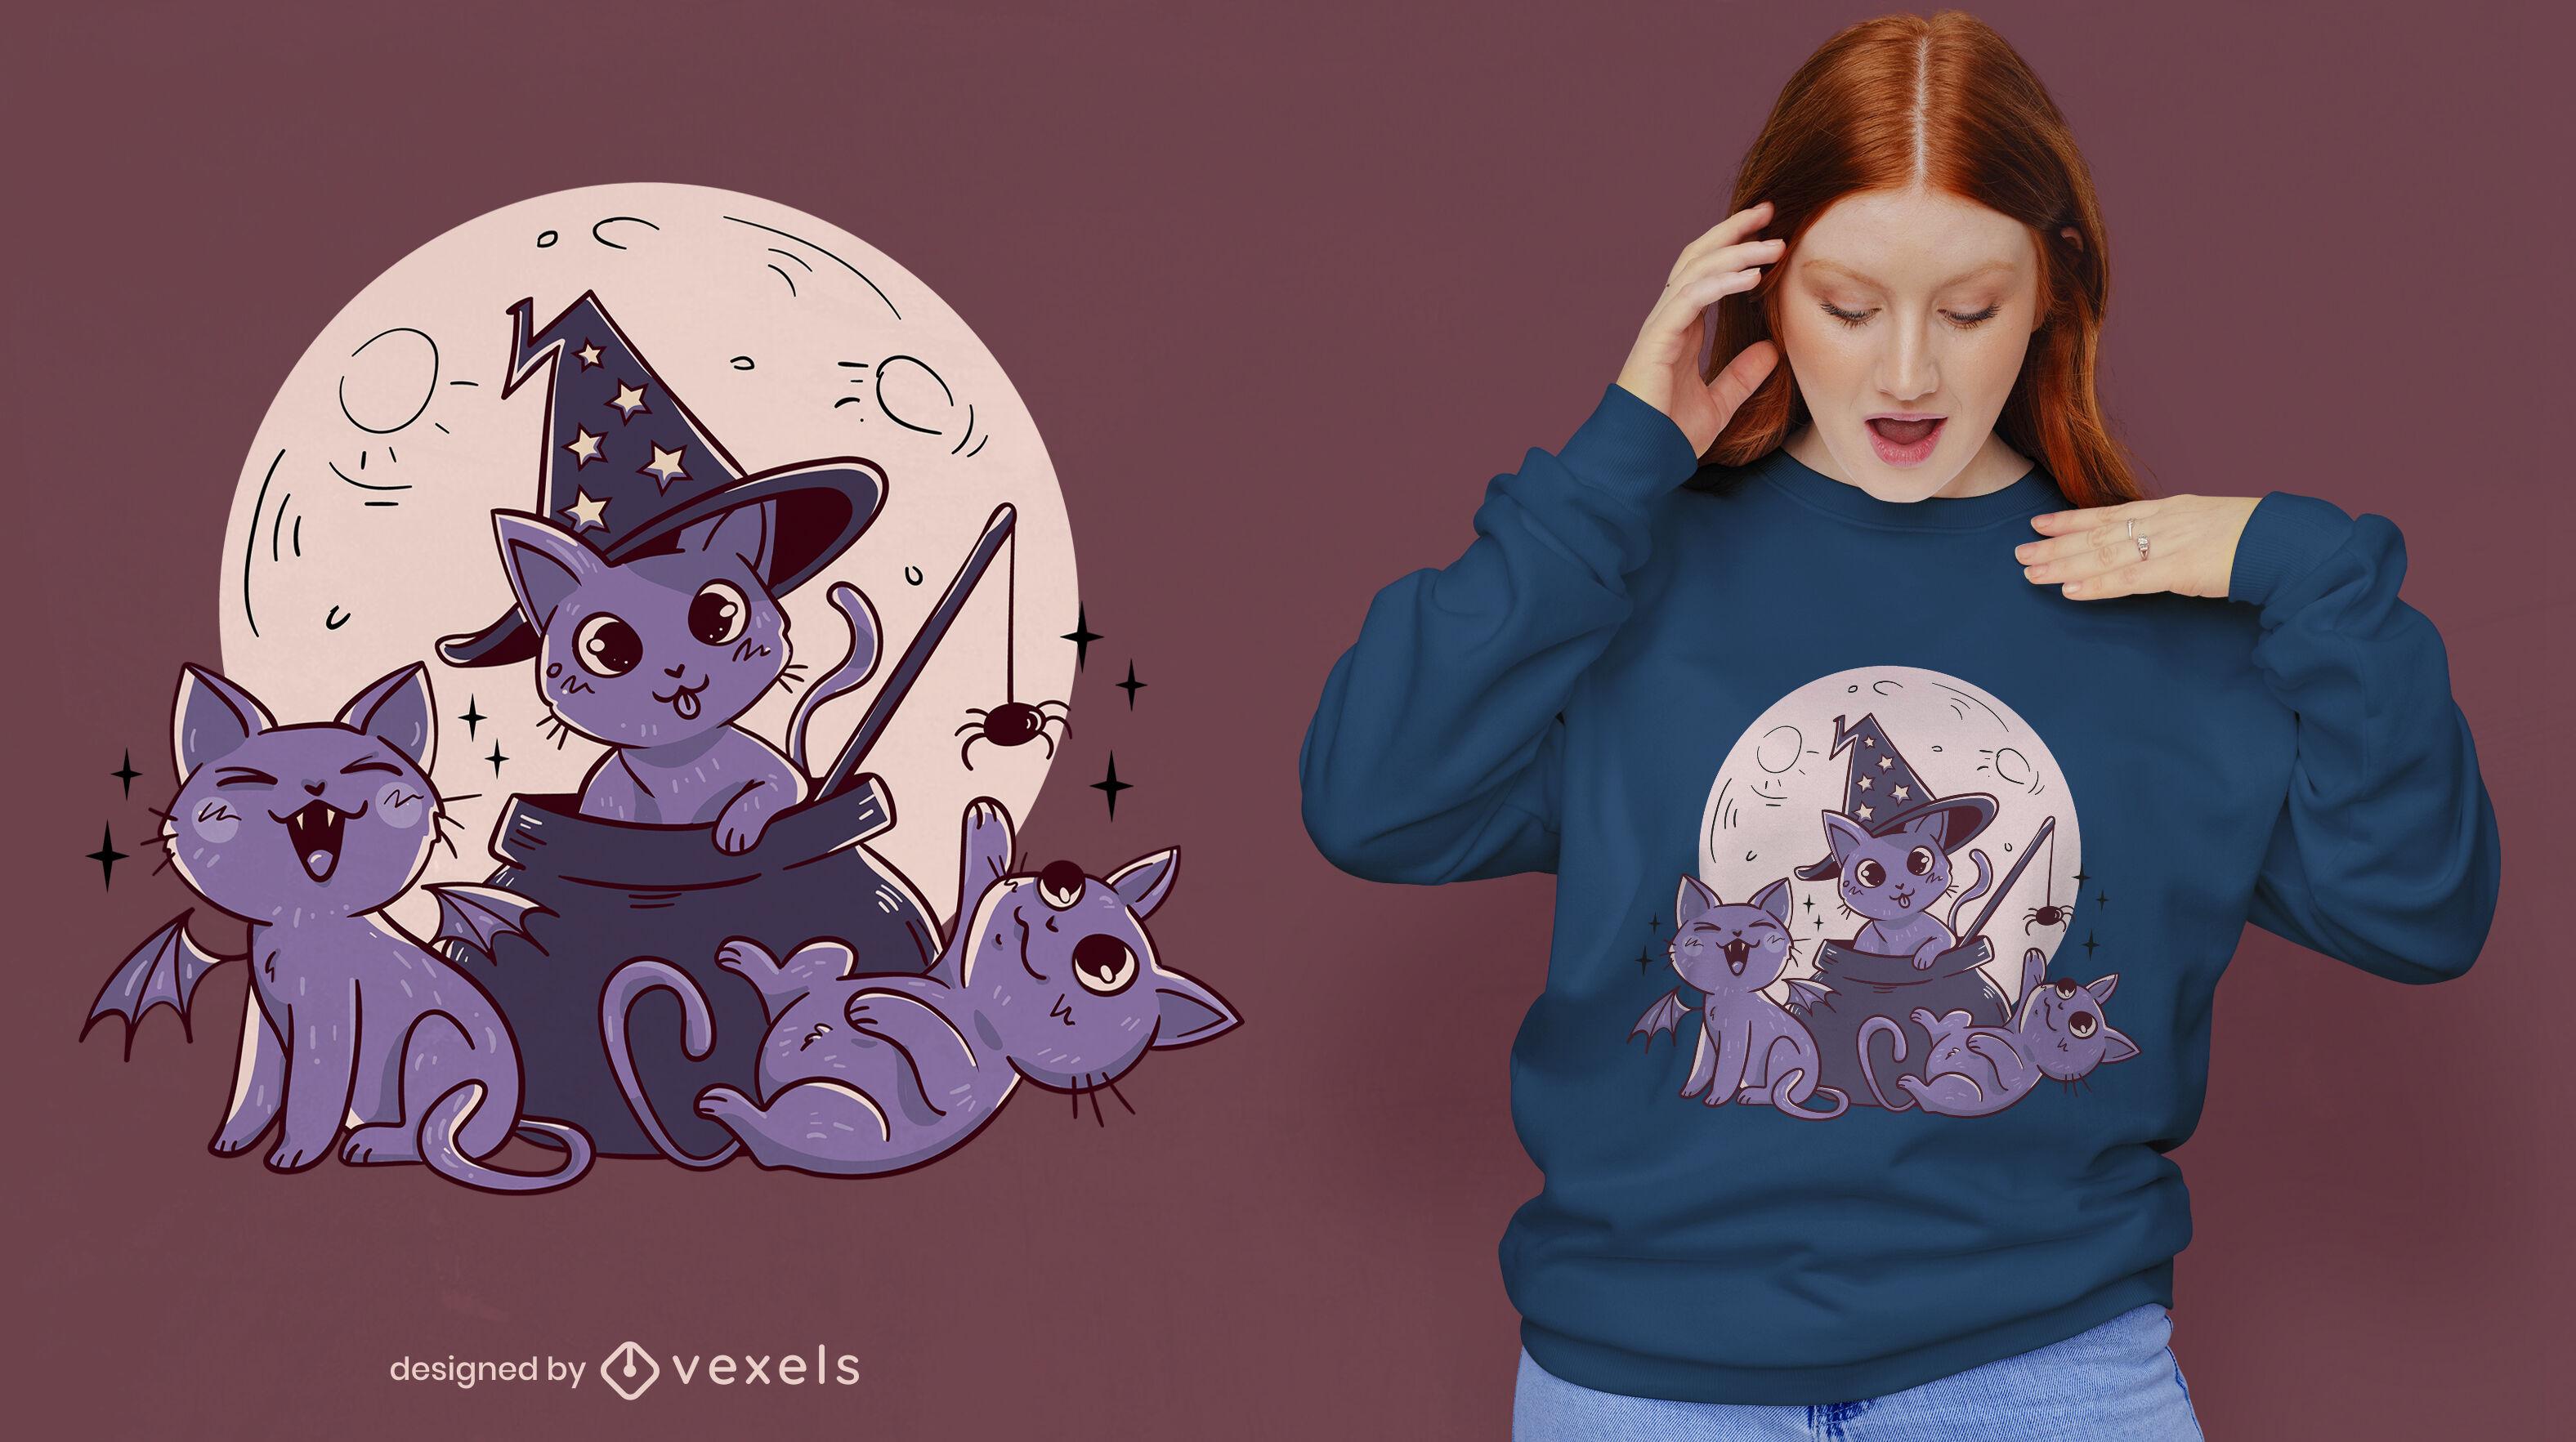 Dise?o de camiseta de gatos lindos de halloween y luna